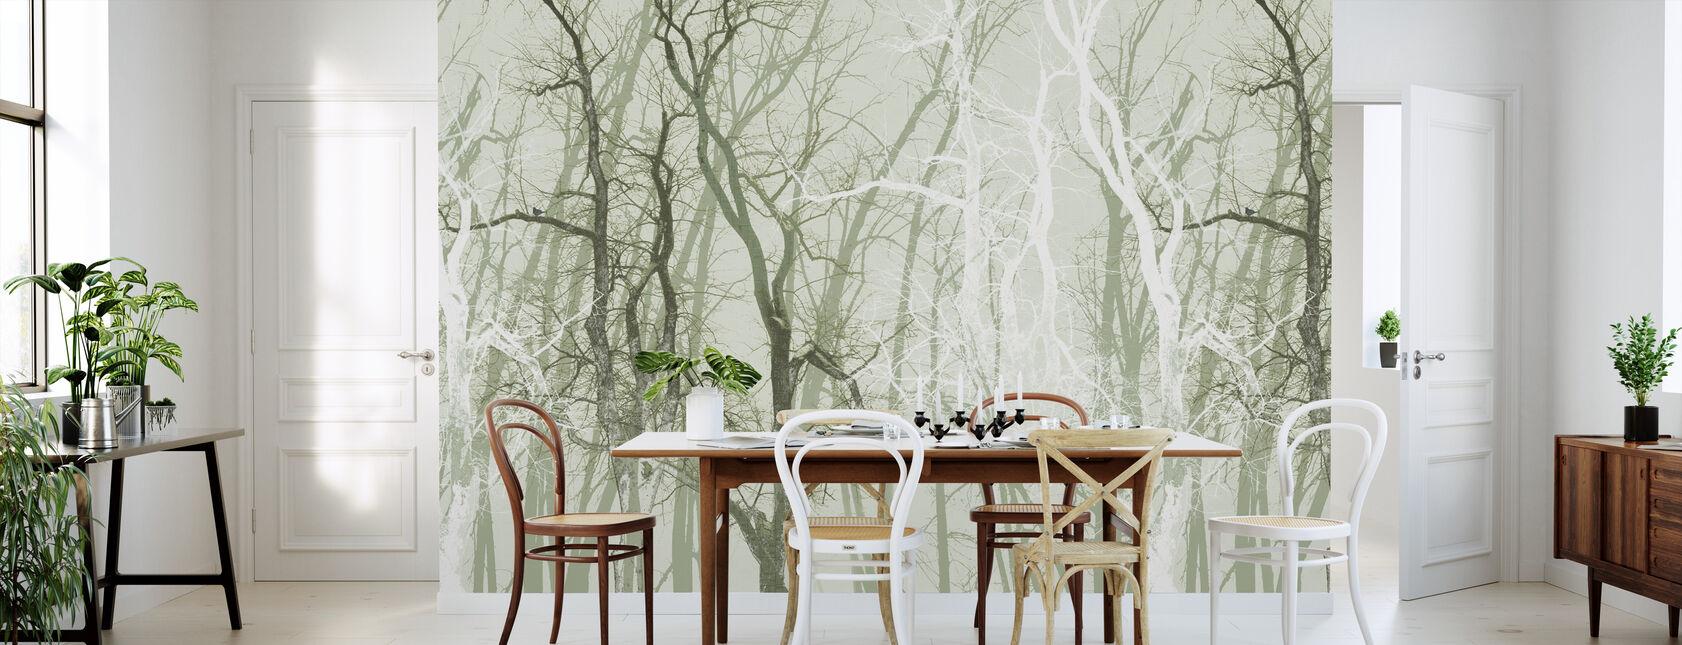 Wander Trees Green - Wallpaper - Kitchen